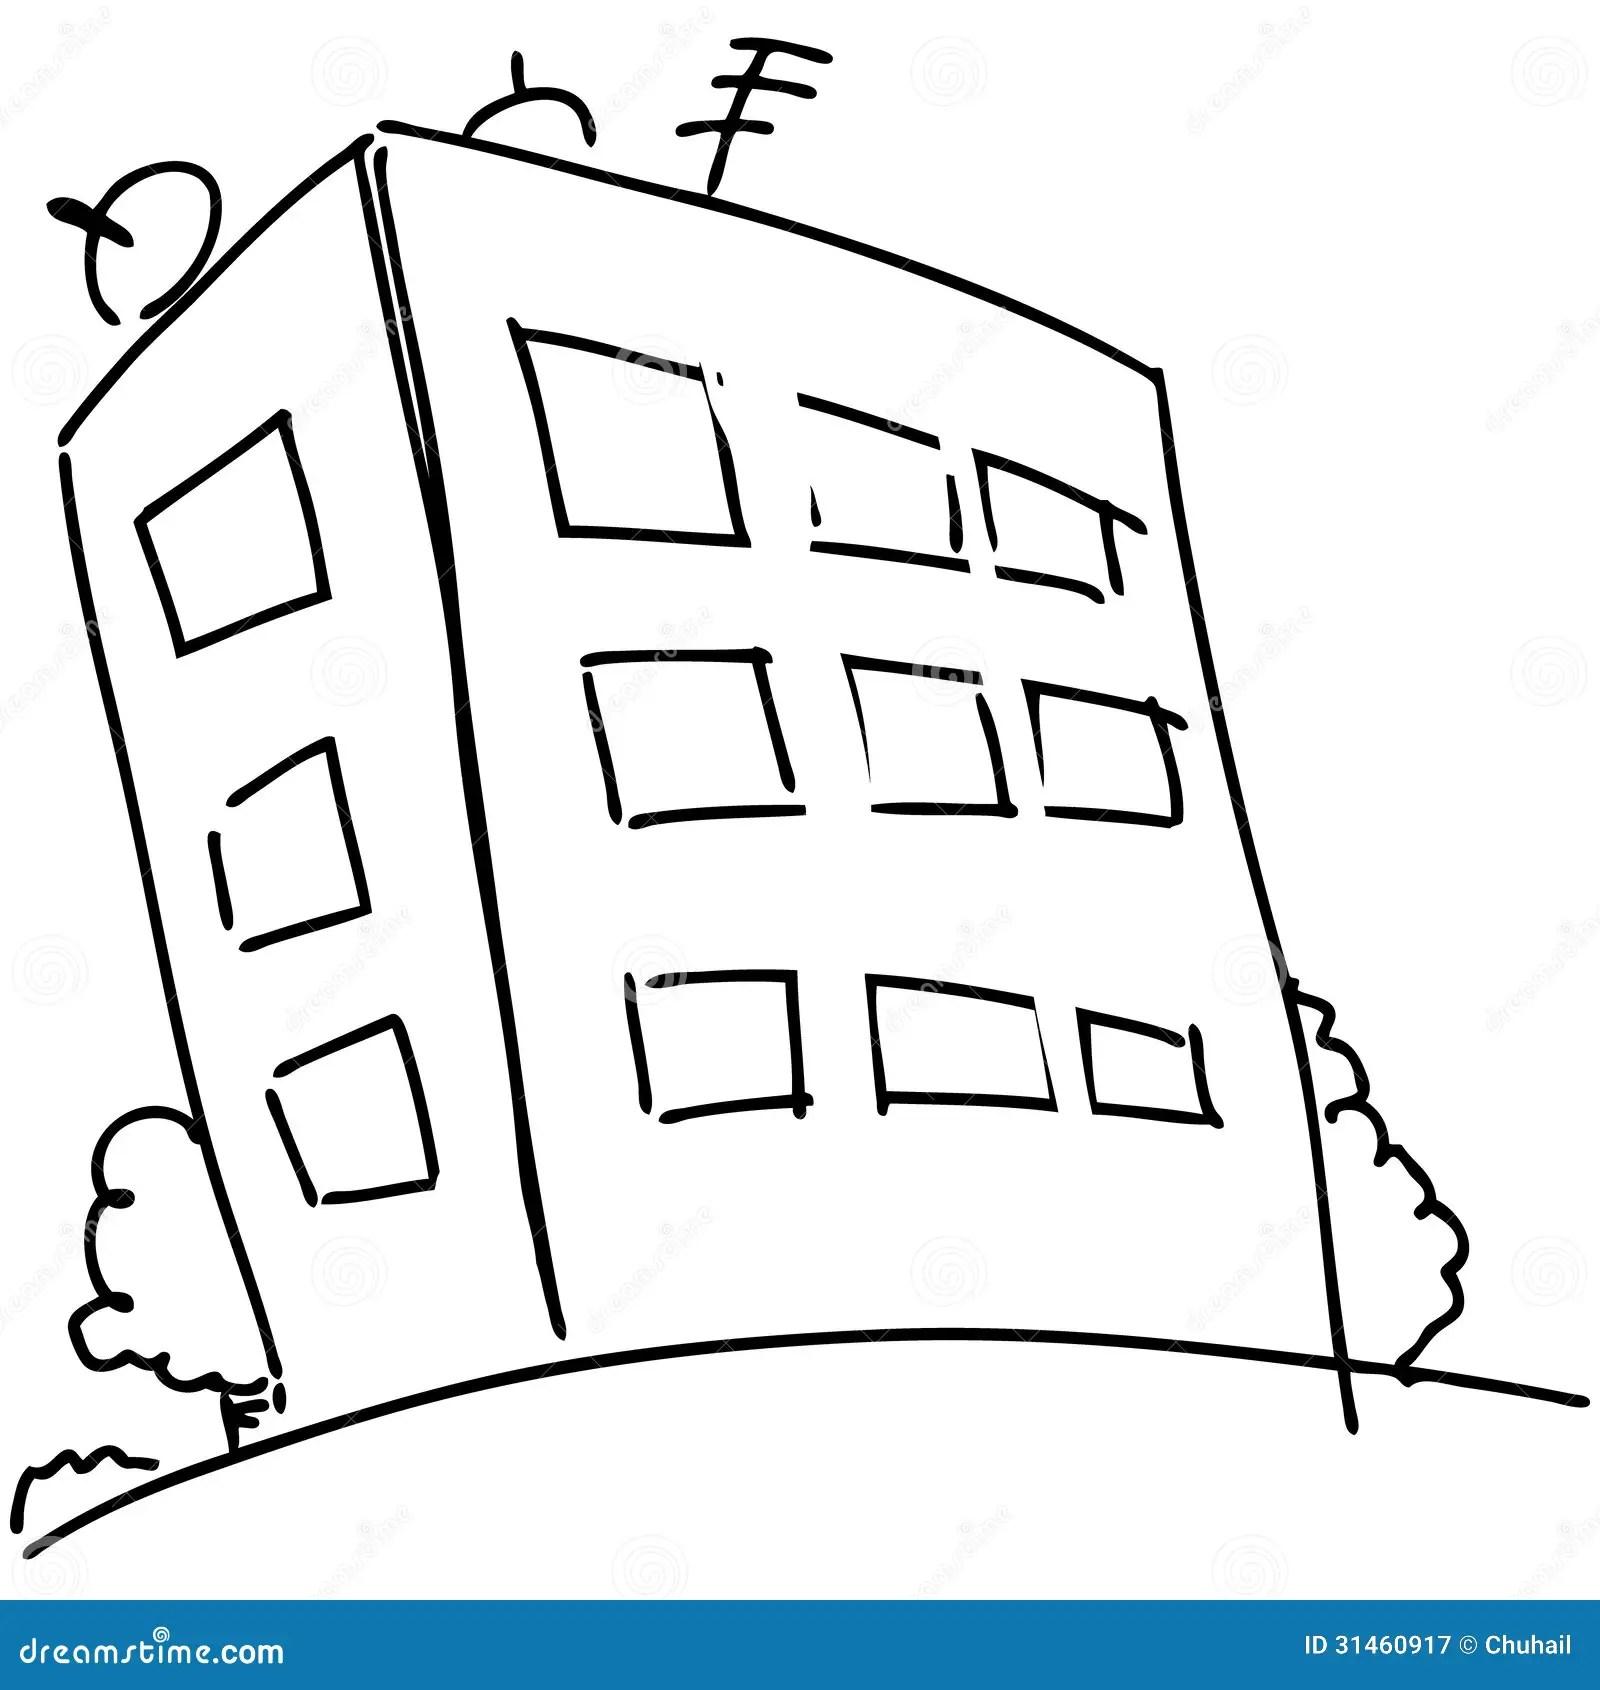 Cartoon block of flats stock vector. Illustration of